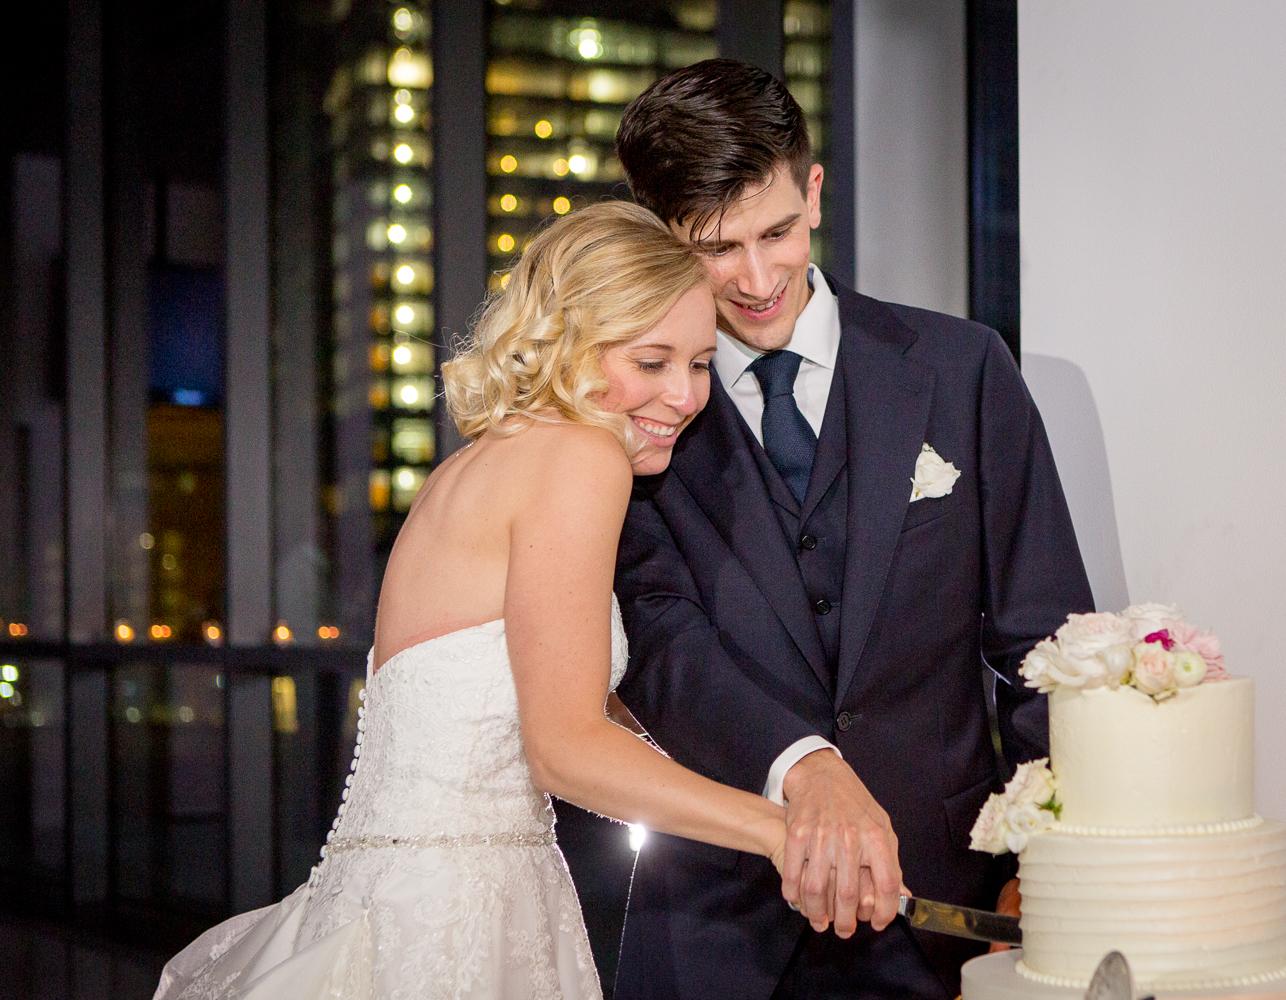 wedding photography-25.jpg